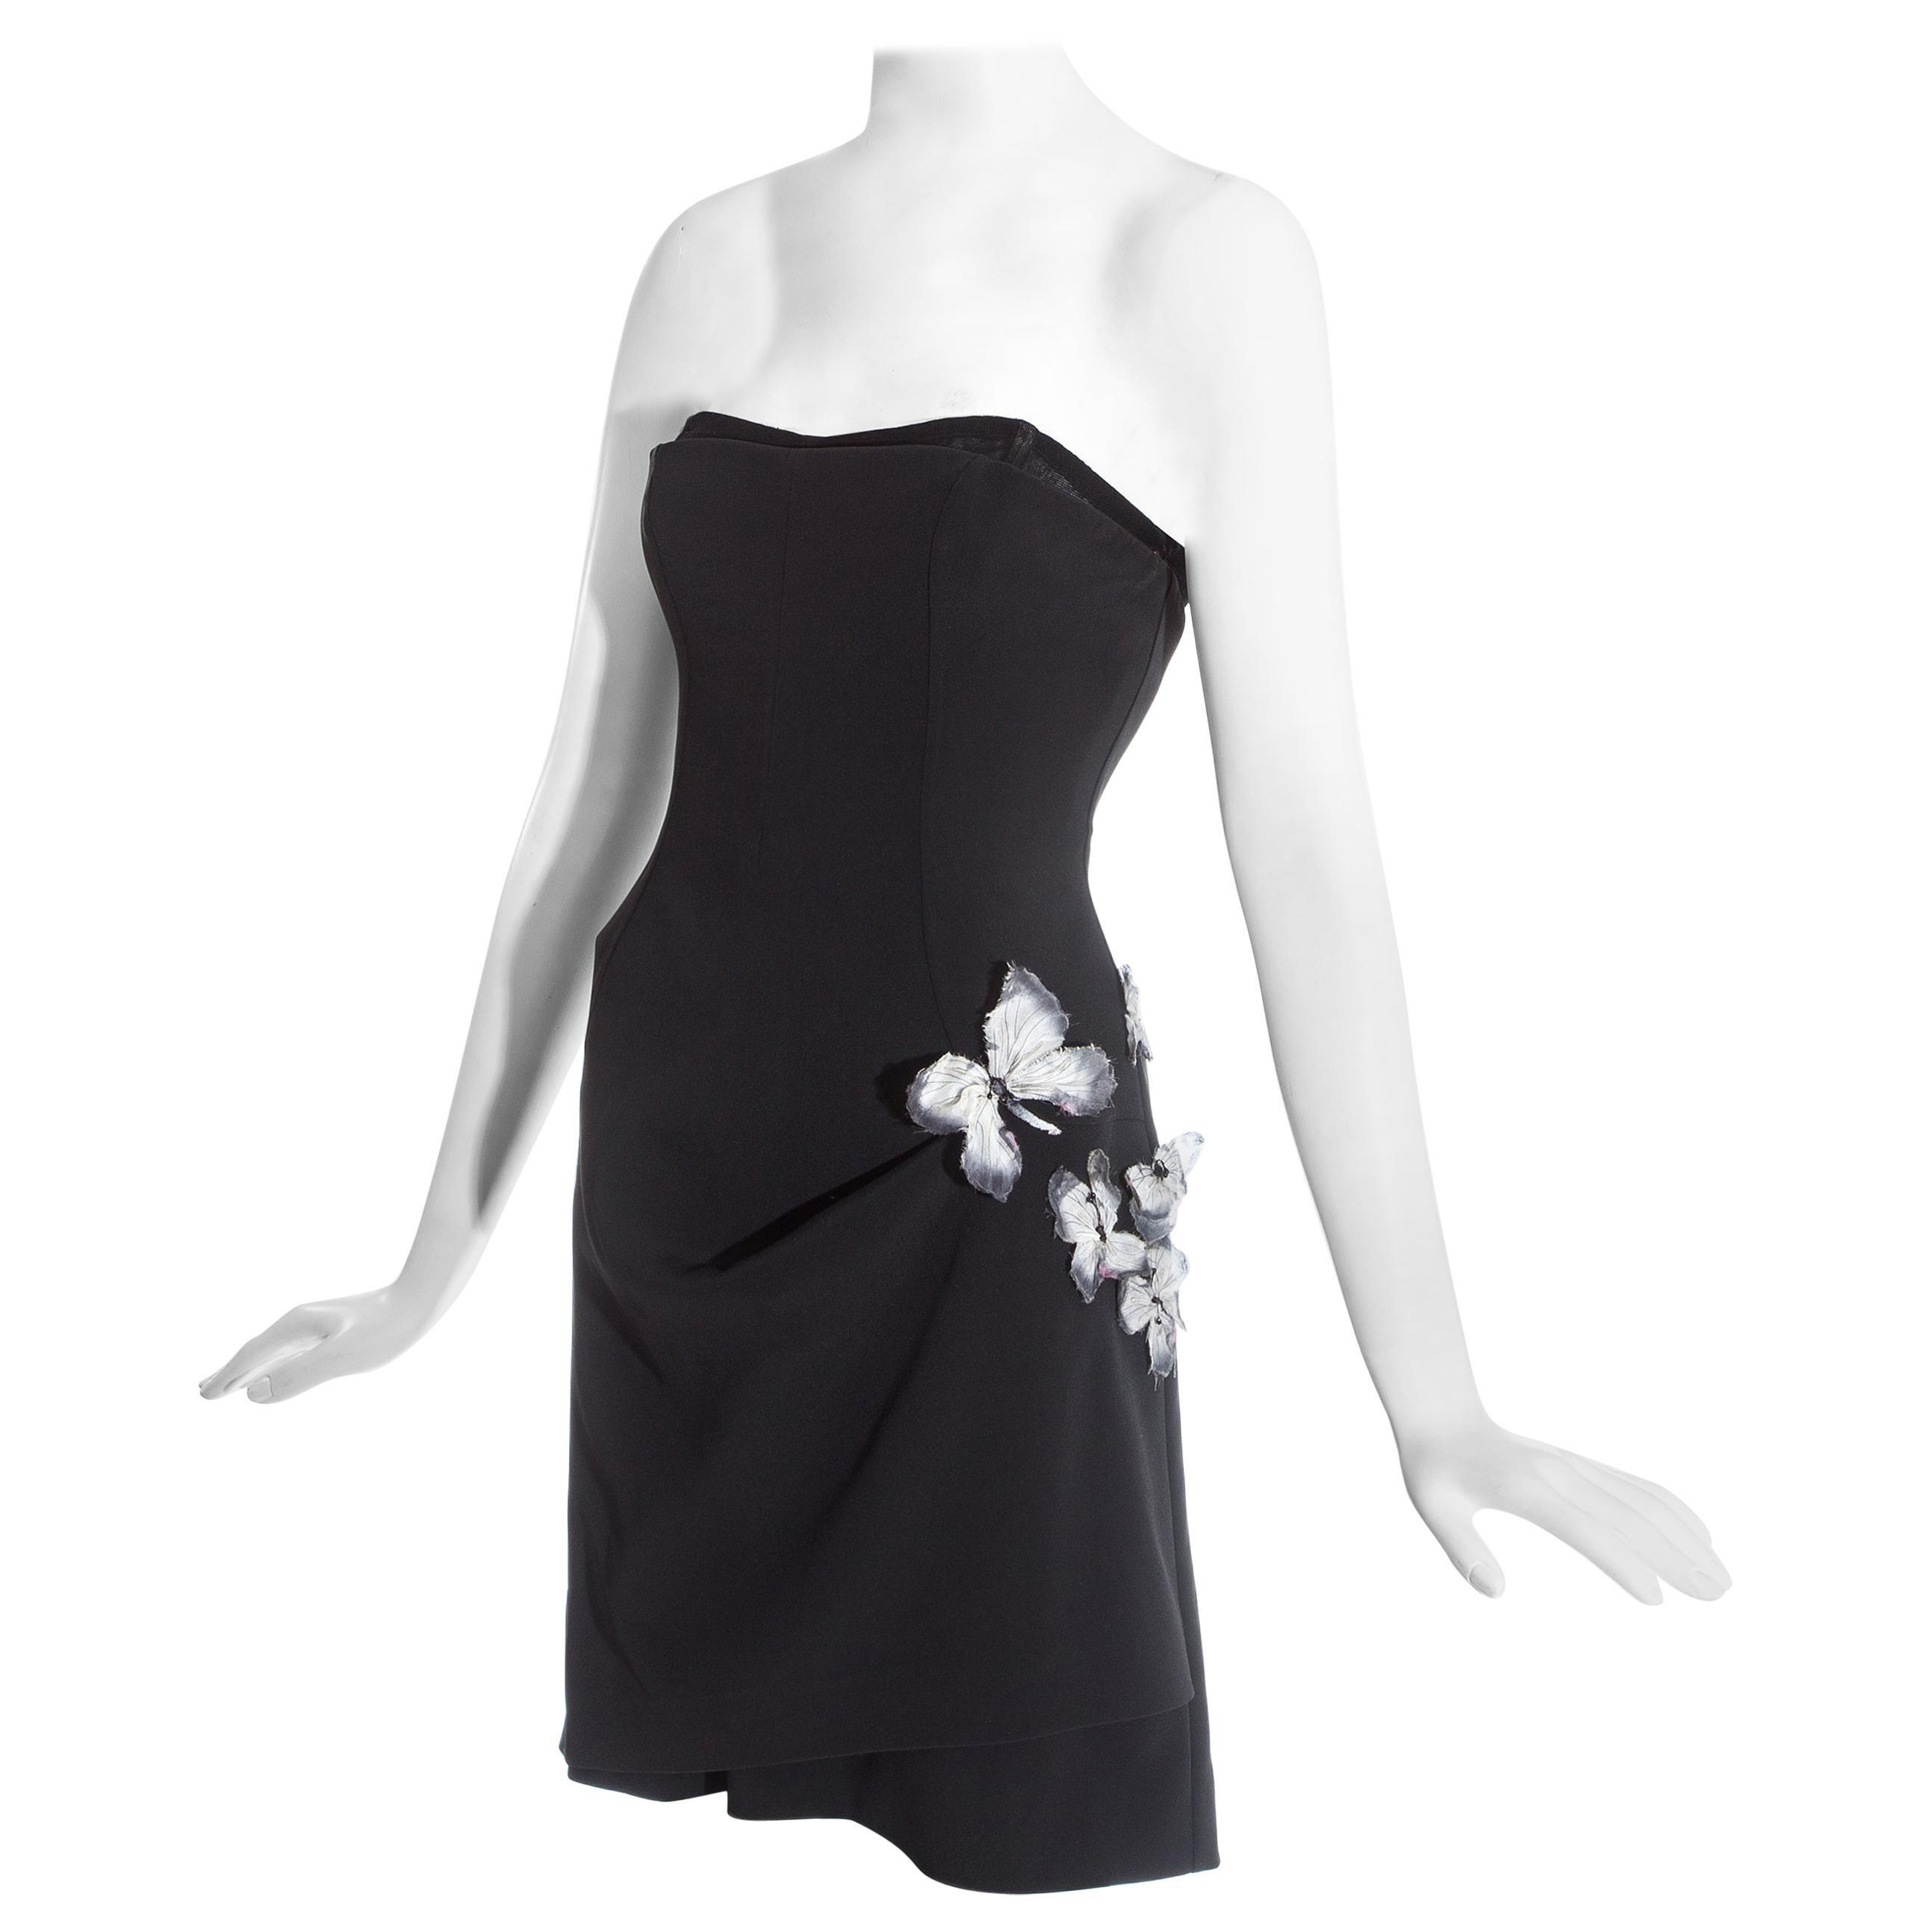 e16b7597 Vintage Dolce & Gabbana: Dresses, Bags & More - 1,372 For Sale at 1stdibs